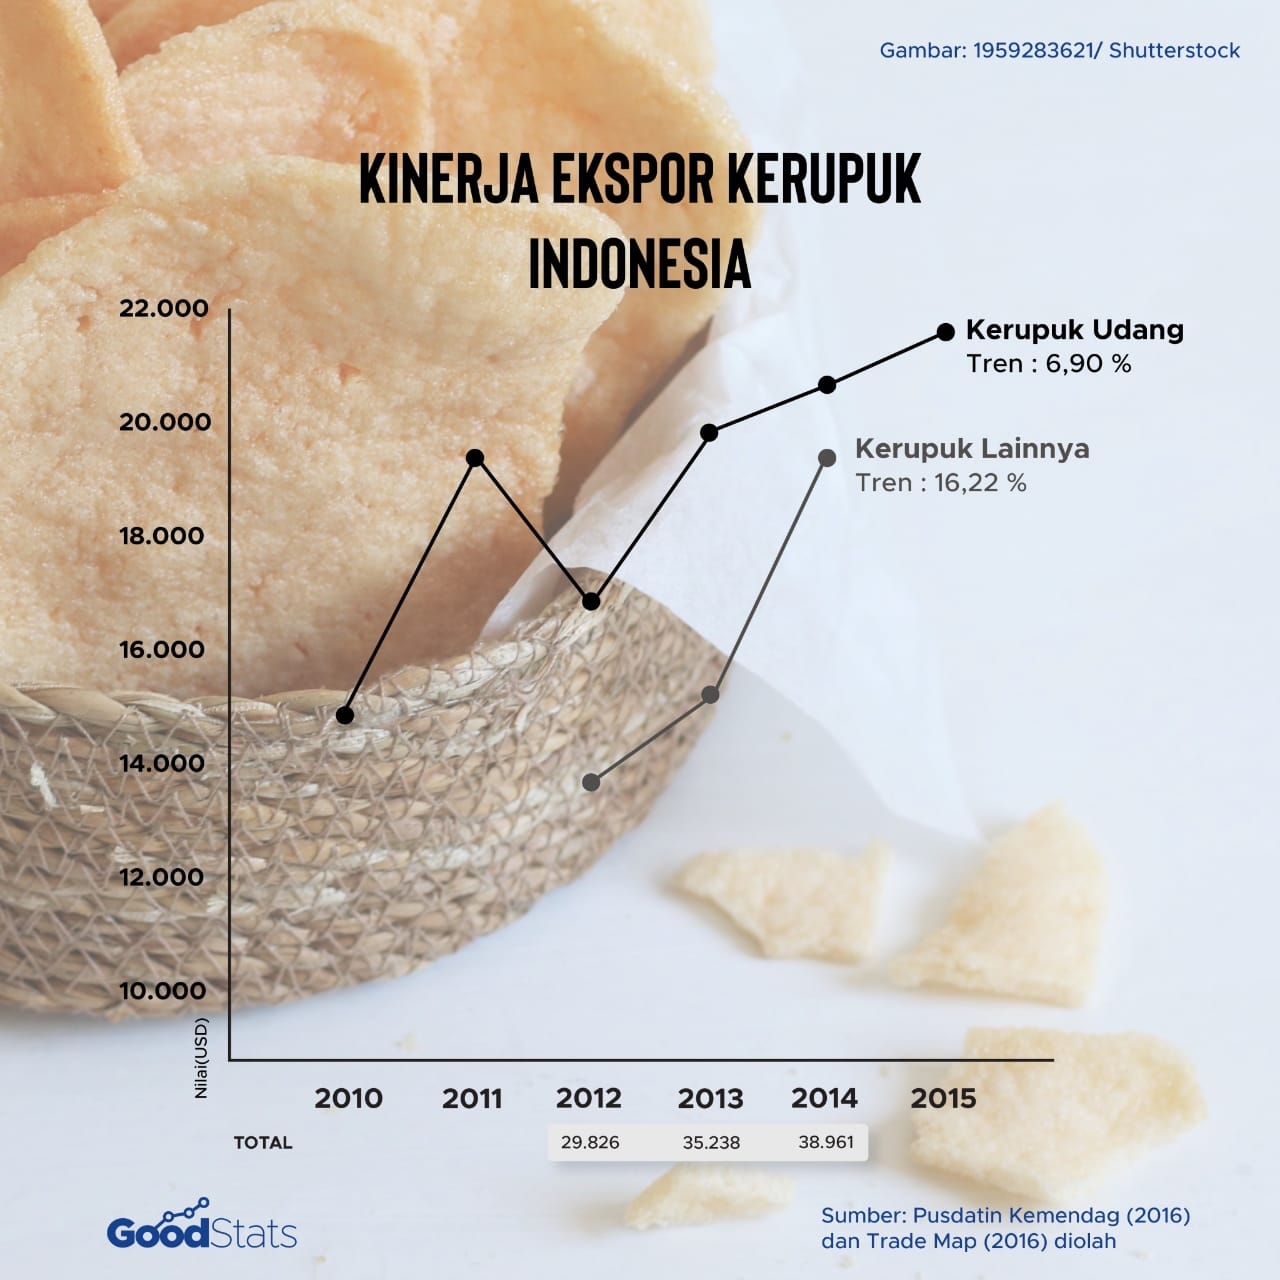 Kinerja ekspor kerupuk | Infografis : GoodStats